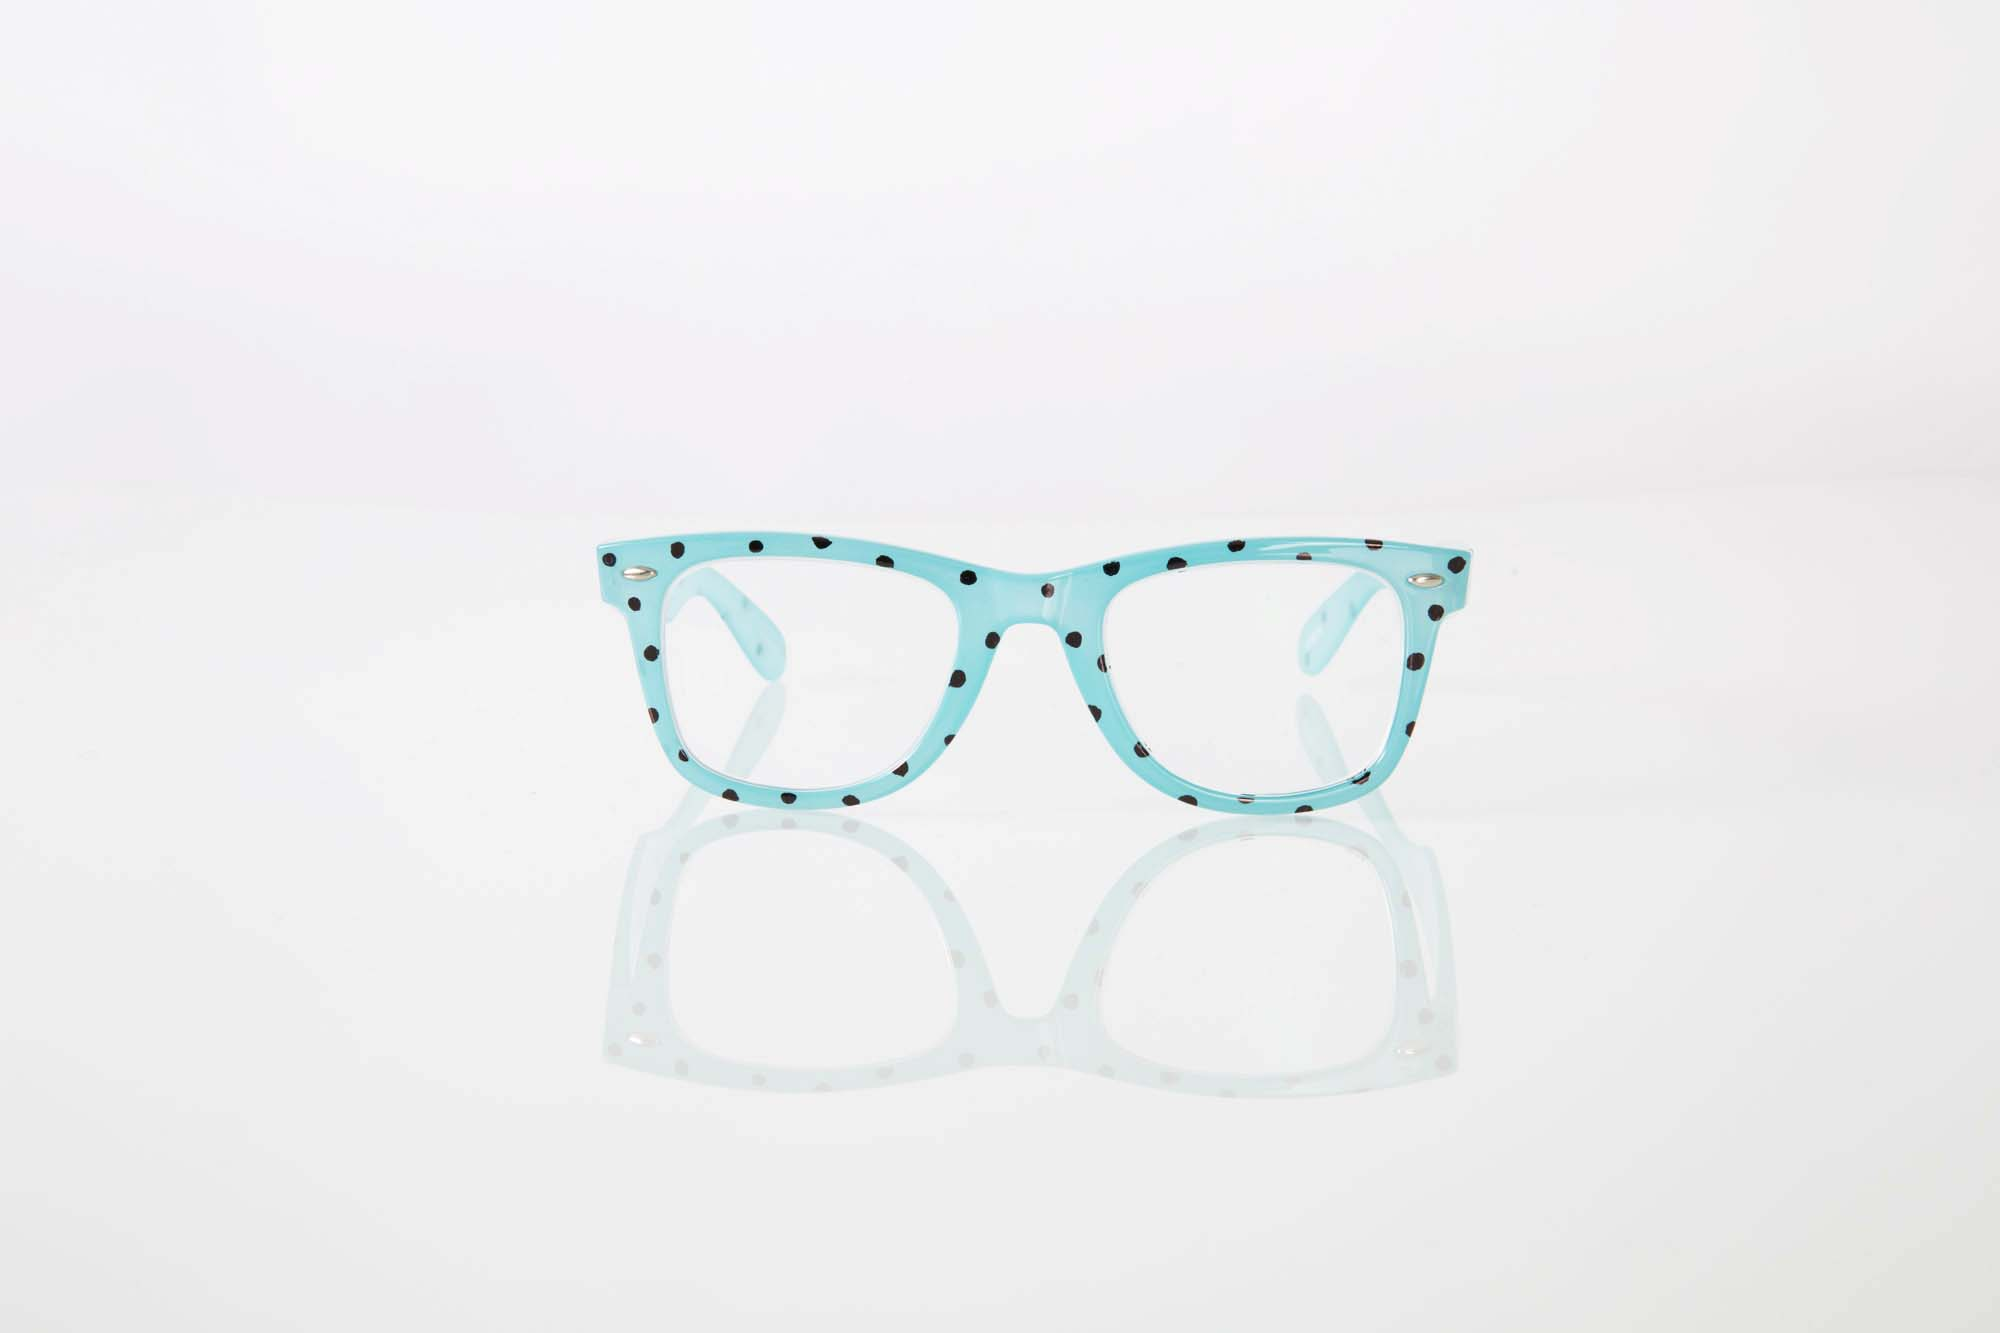 Zenni Optical Polka Dot Glasses : DIY Guide To Decorating Glasses Through the Lens